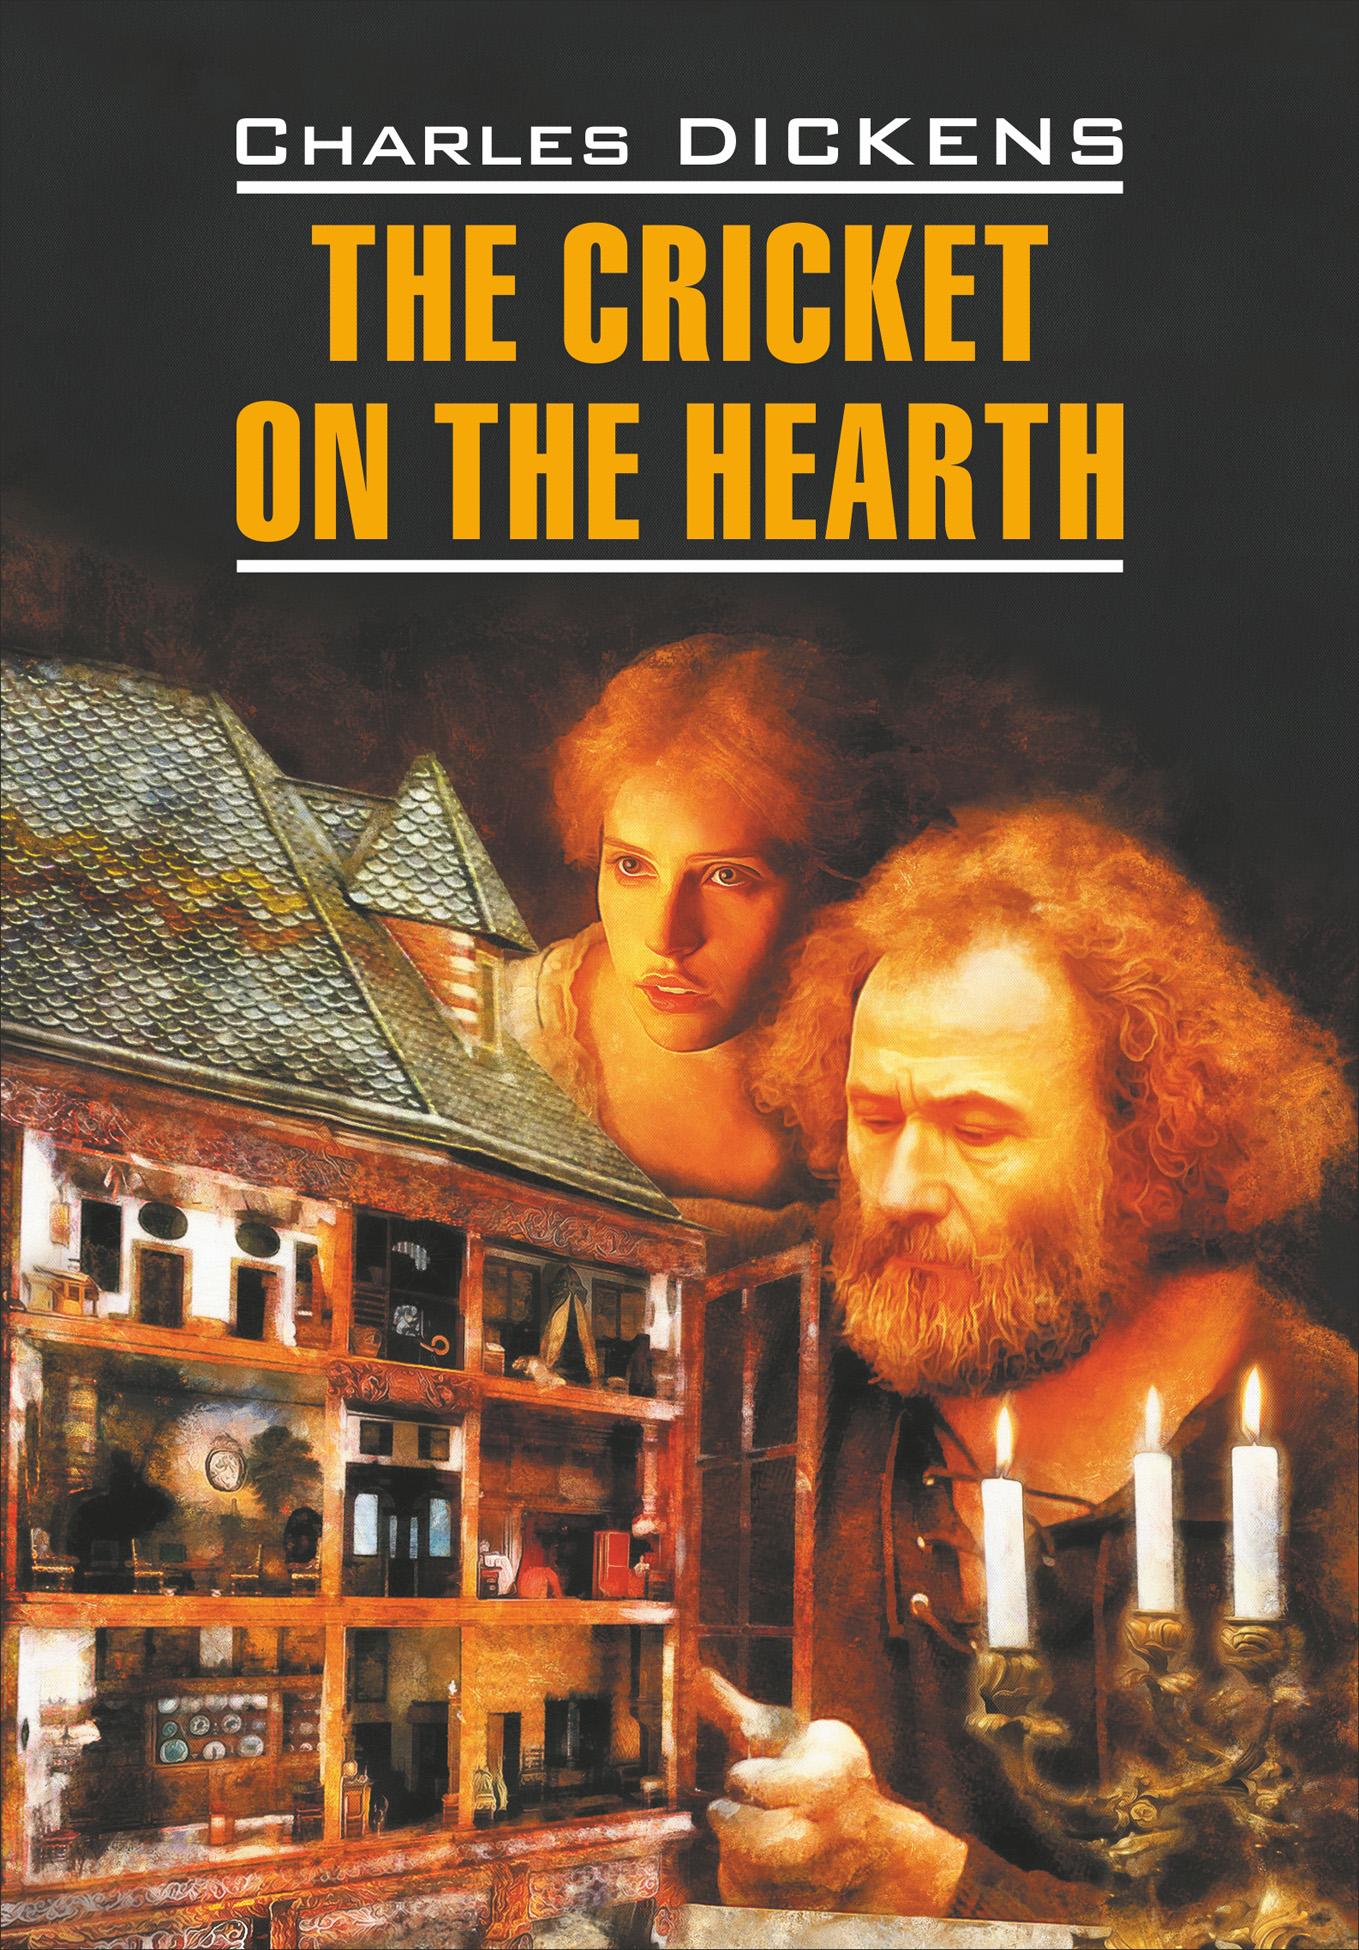 Чарльз Диккенс The Cricket on the Hearth / Сверчок за очагом. Книга для чтения на английском языке dickens c christmas stories the cricket on the hearth рождественские истории сверчок за очагом на англ яз